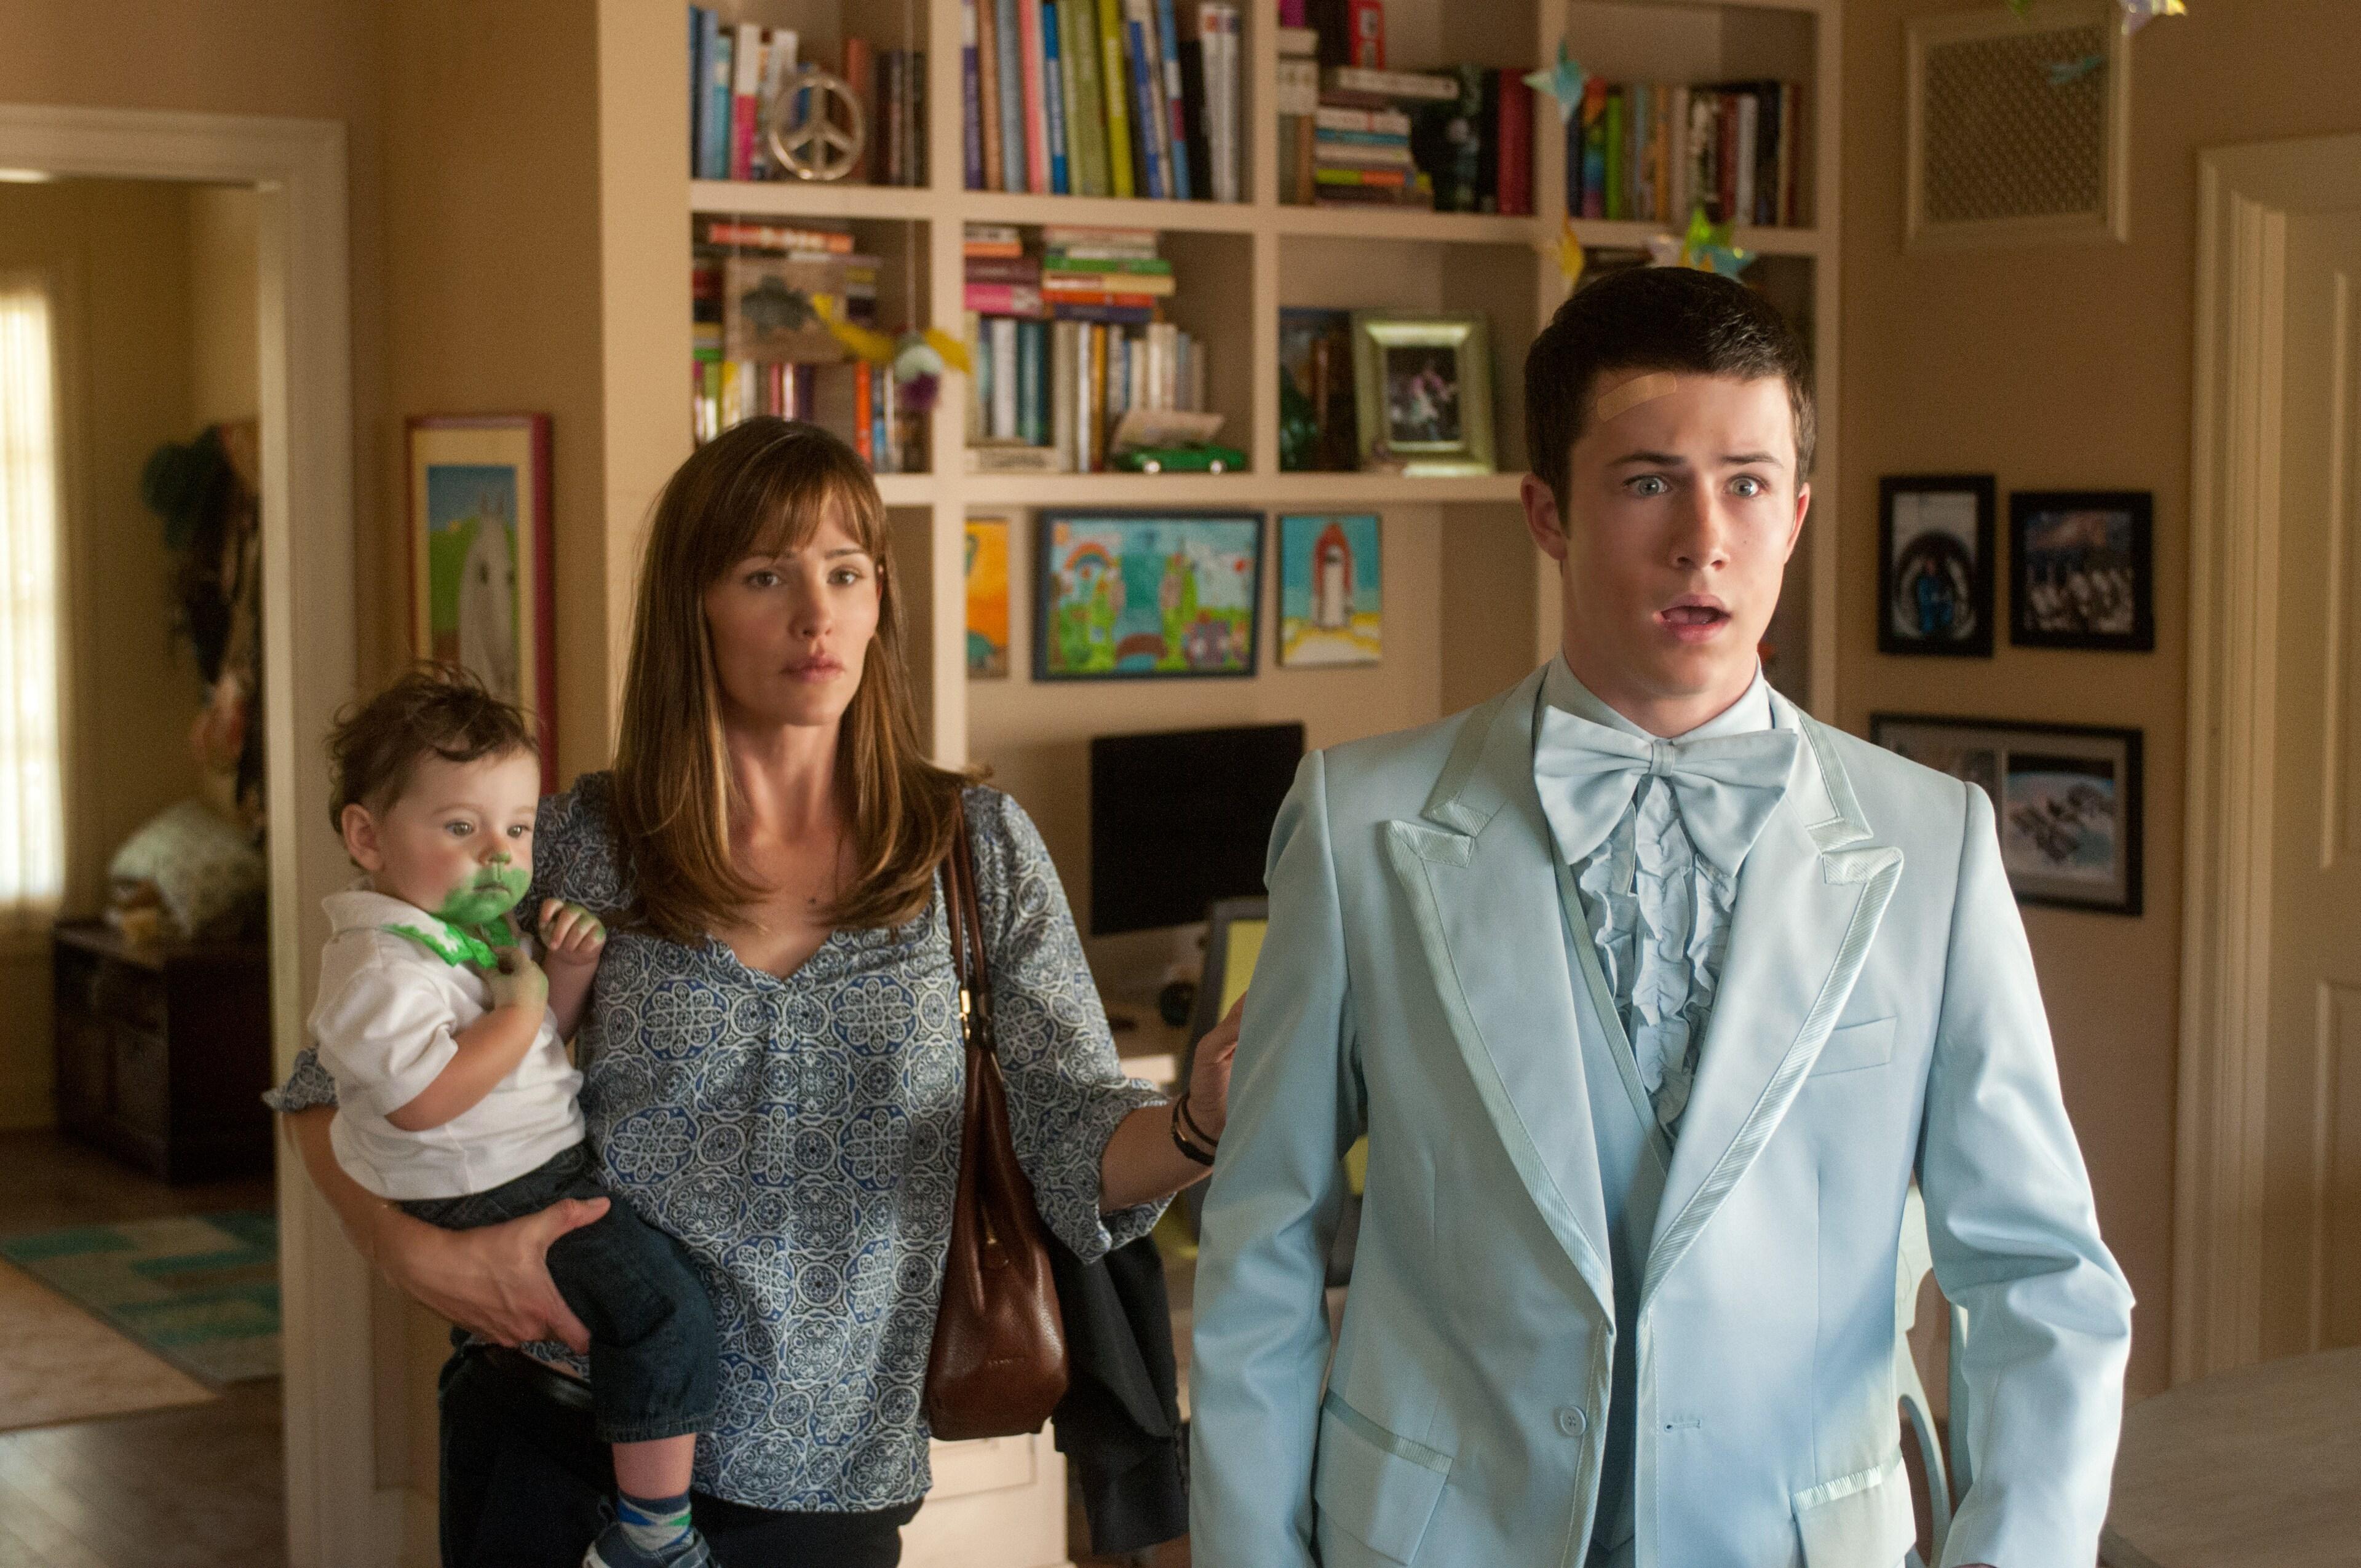 Dylan Minnette as Anthony Cooper, Jennifer Garner as Kelly Cooper and Zoey/Elise Vargas as Baby Trevor